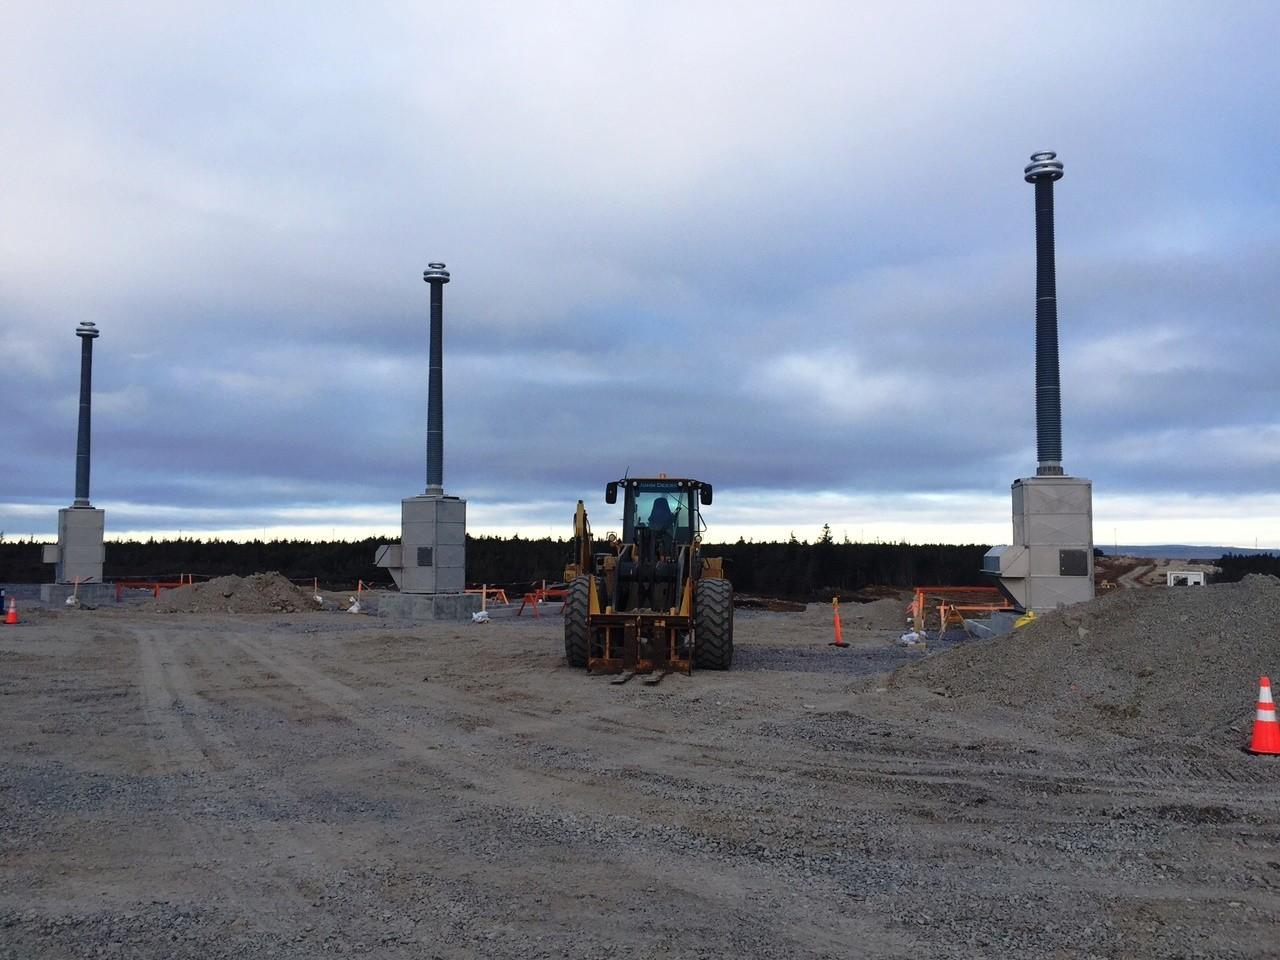 SOBI Land cable installation_Shoal Cove IMG4706_Nov2015.jpeg